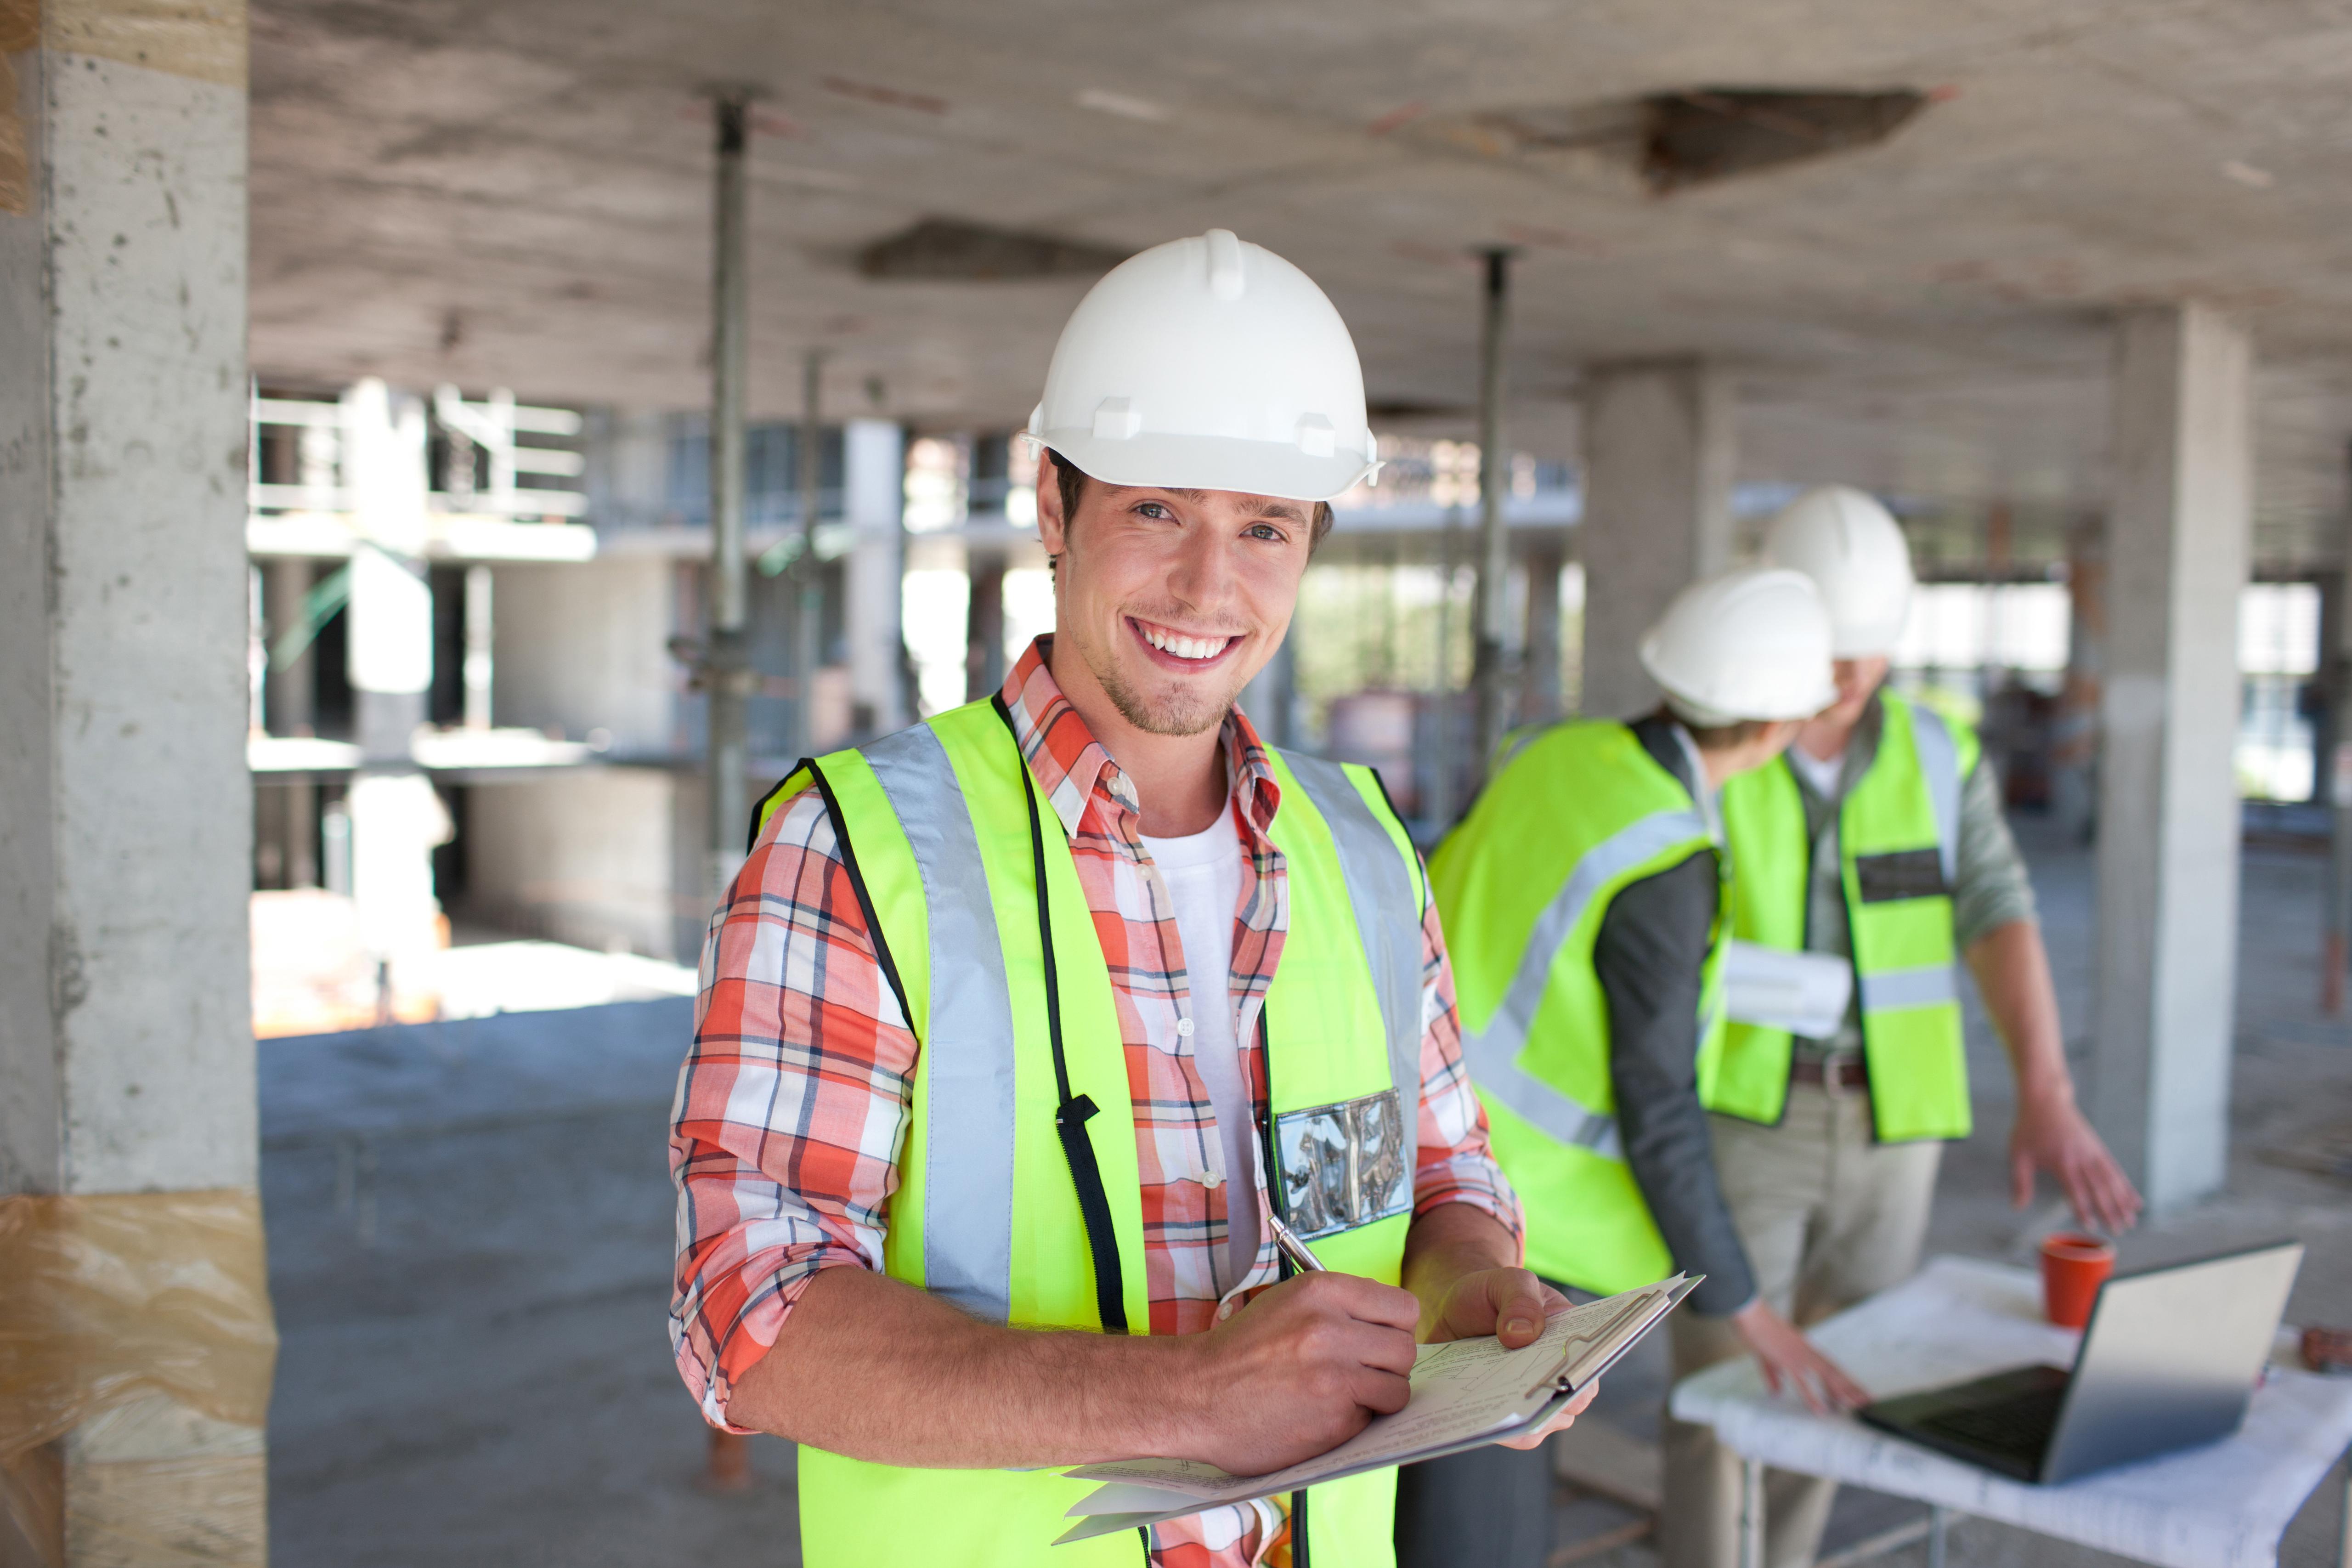 Subcontractors on job site